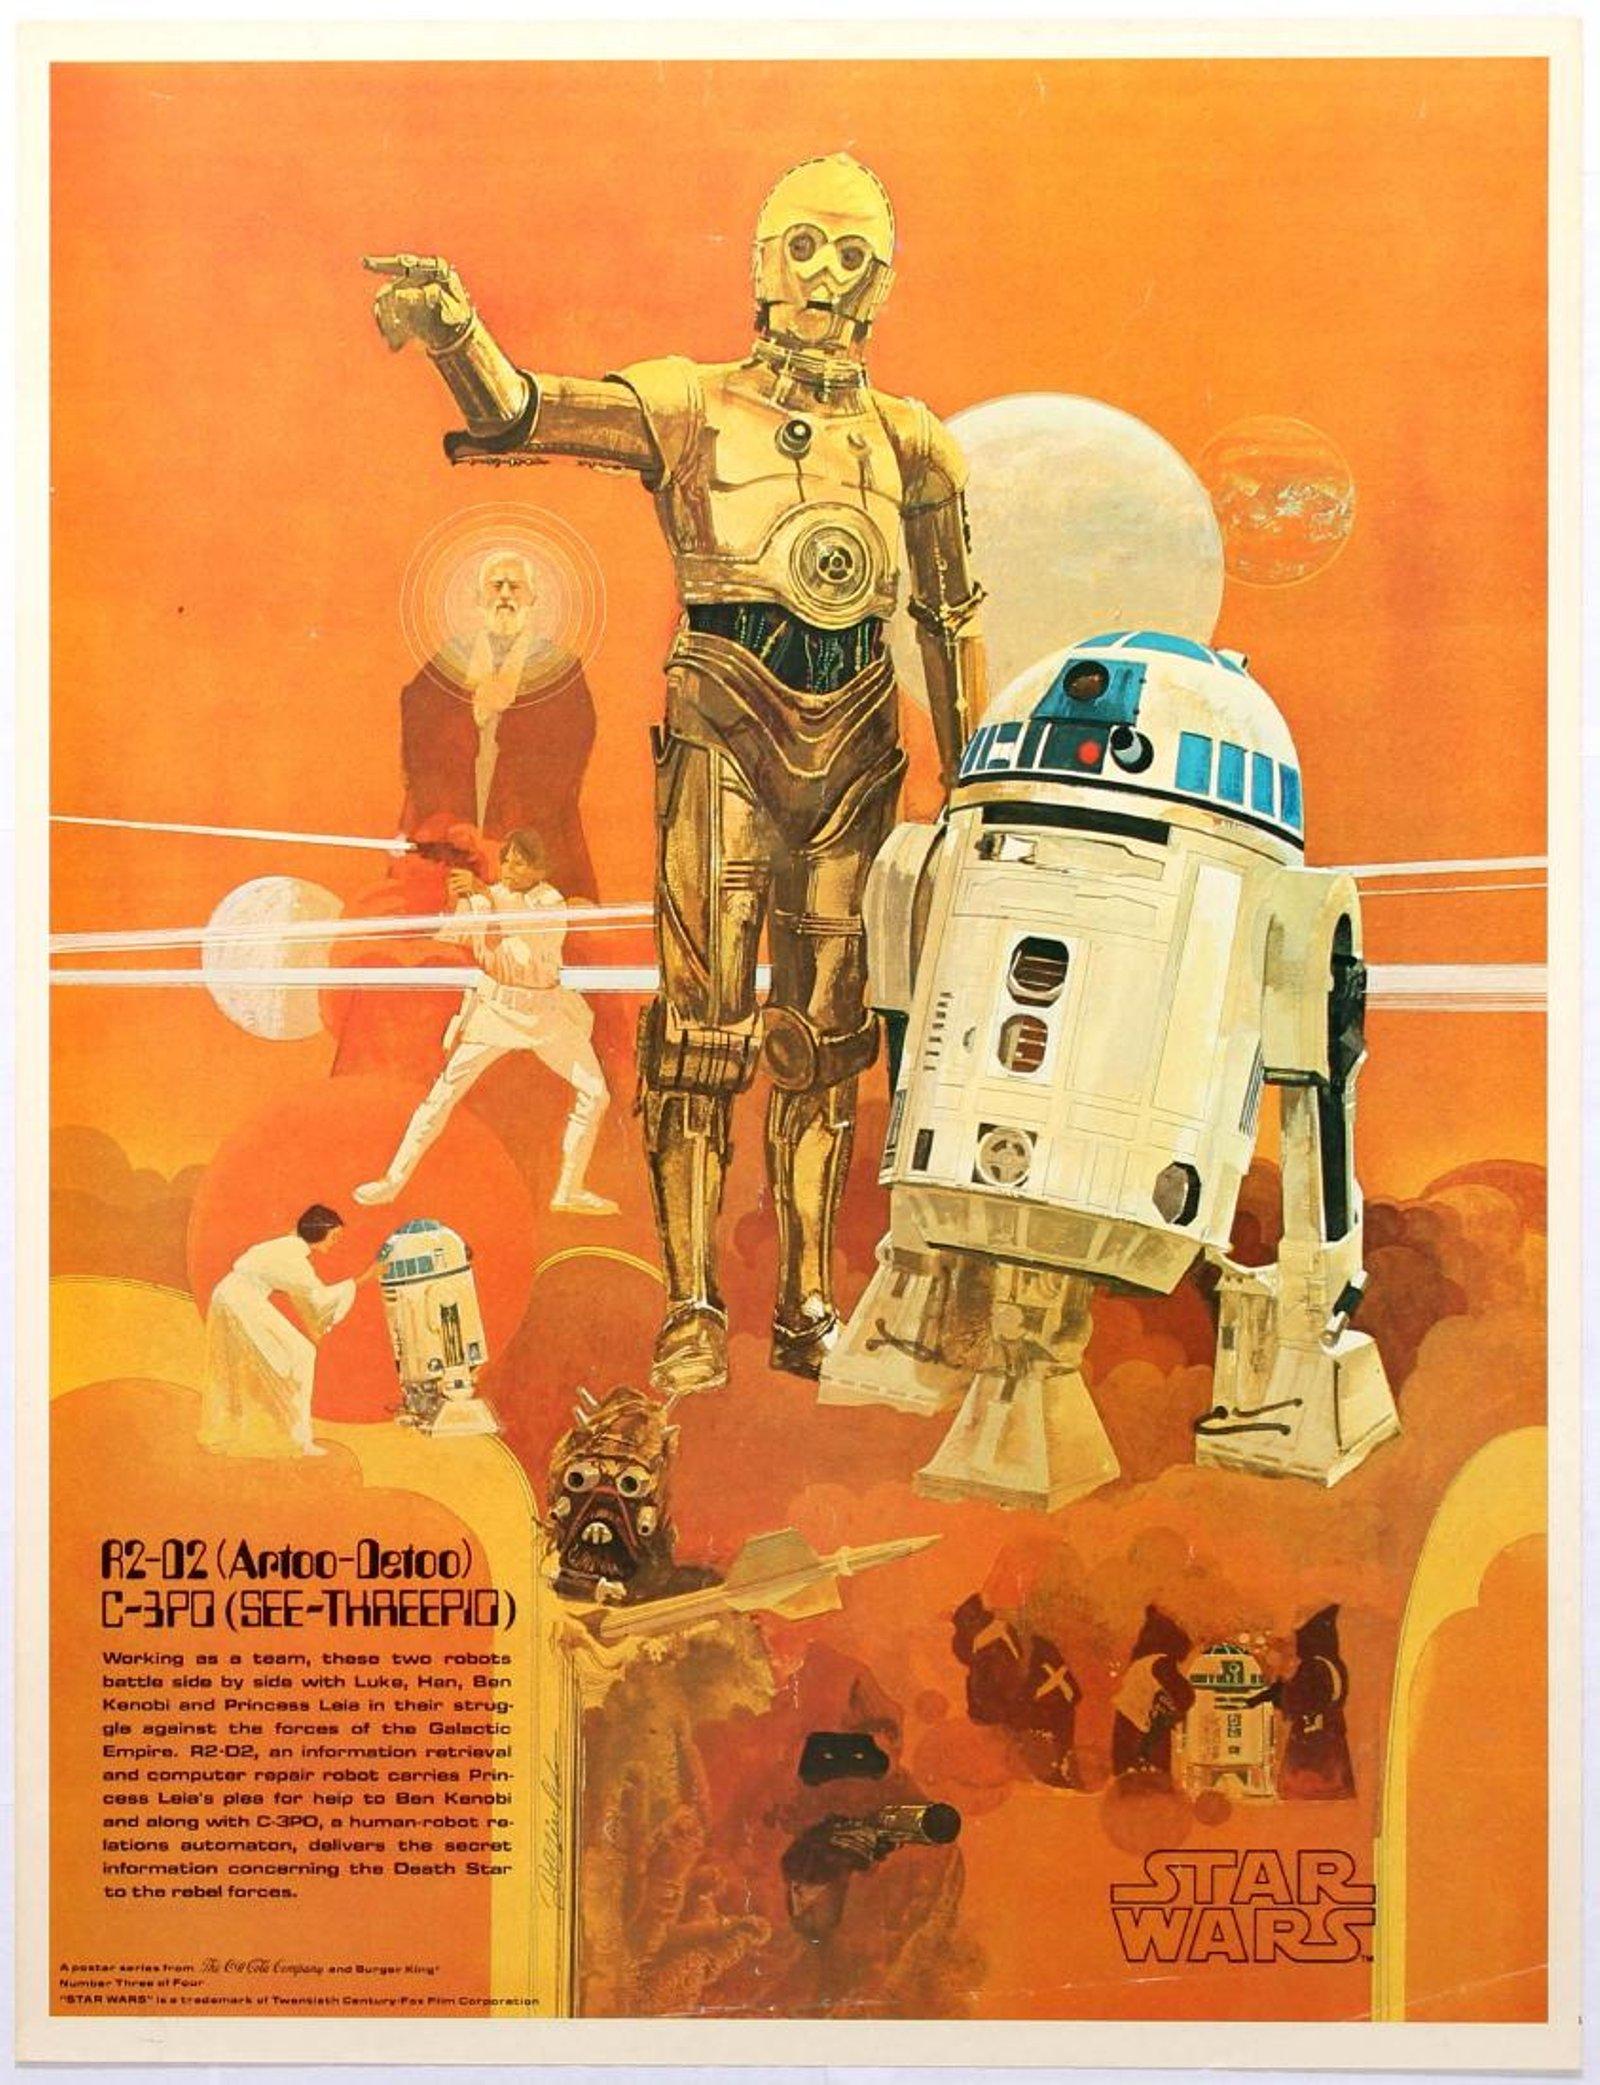 Star Wars Coca Cola R2D2 C3PO